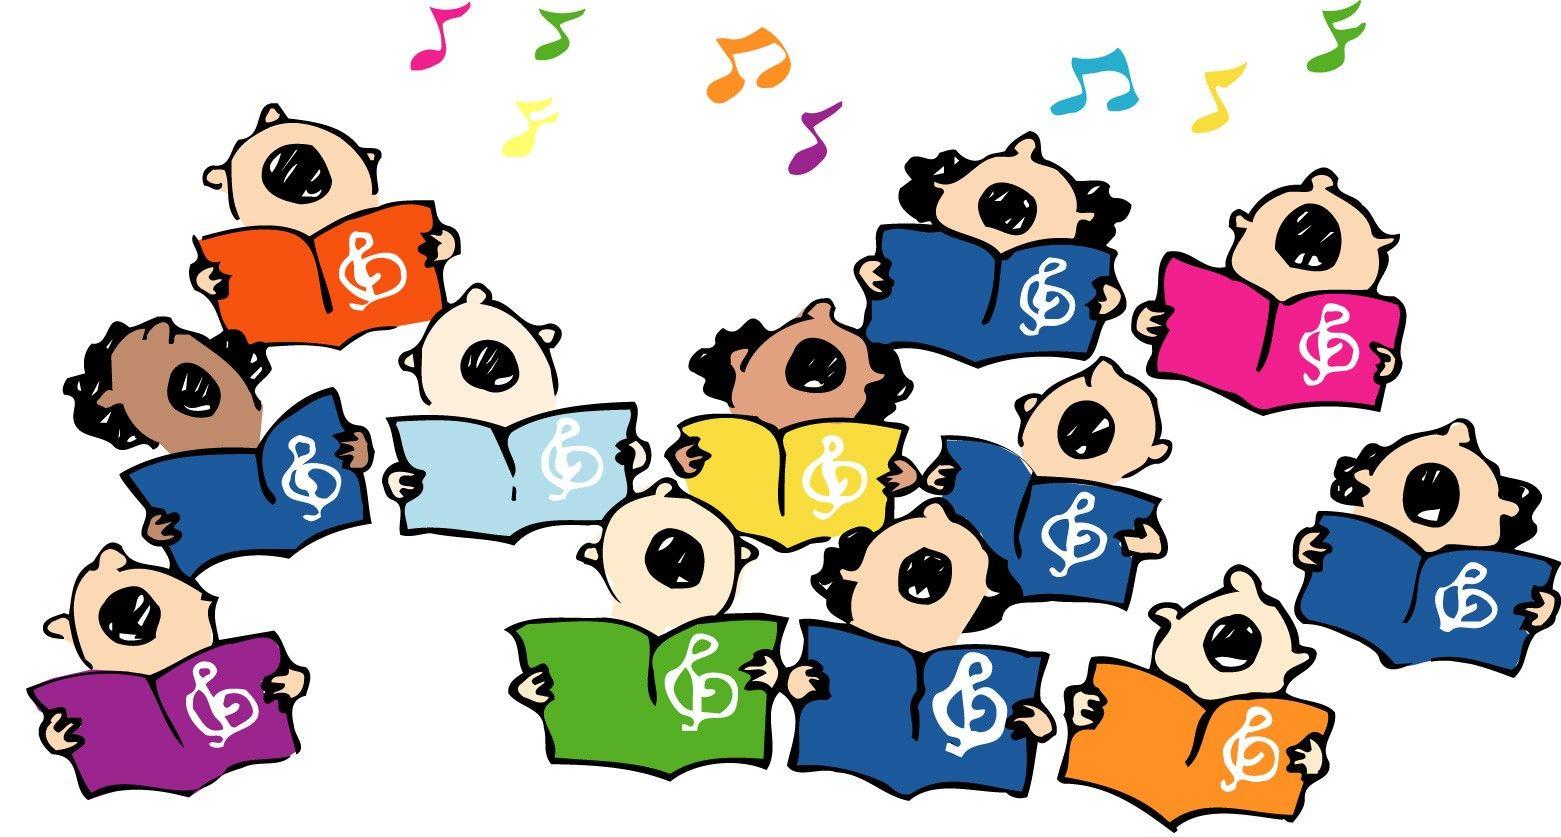 Choir clipart chamber choir. Harmony chorale brings inspiration